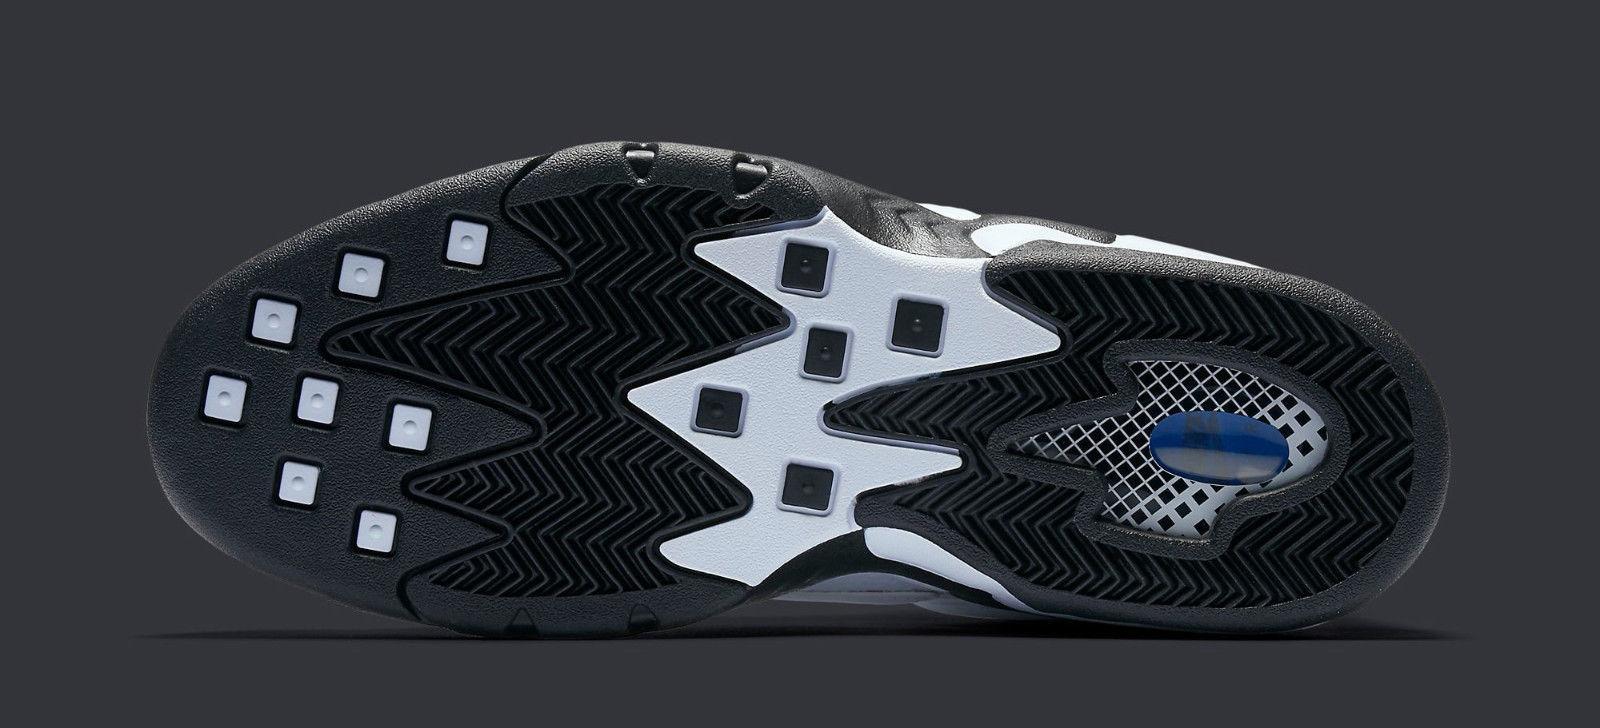 ... NEW Men's Nike Air Max 2 Uptempo '94 Retro 922934-102 White/Black ...